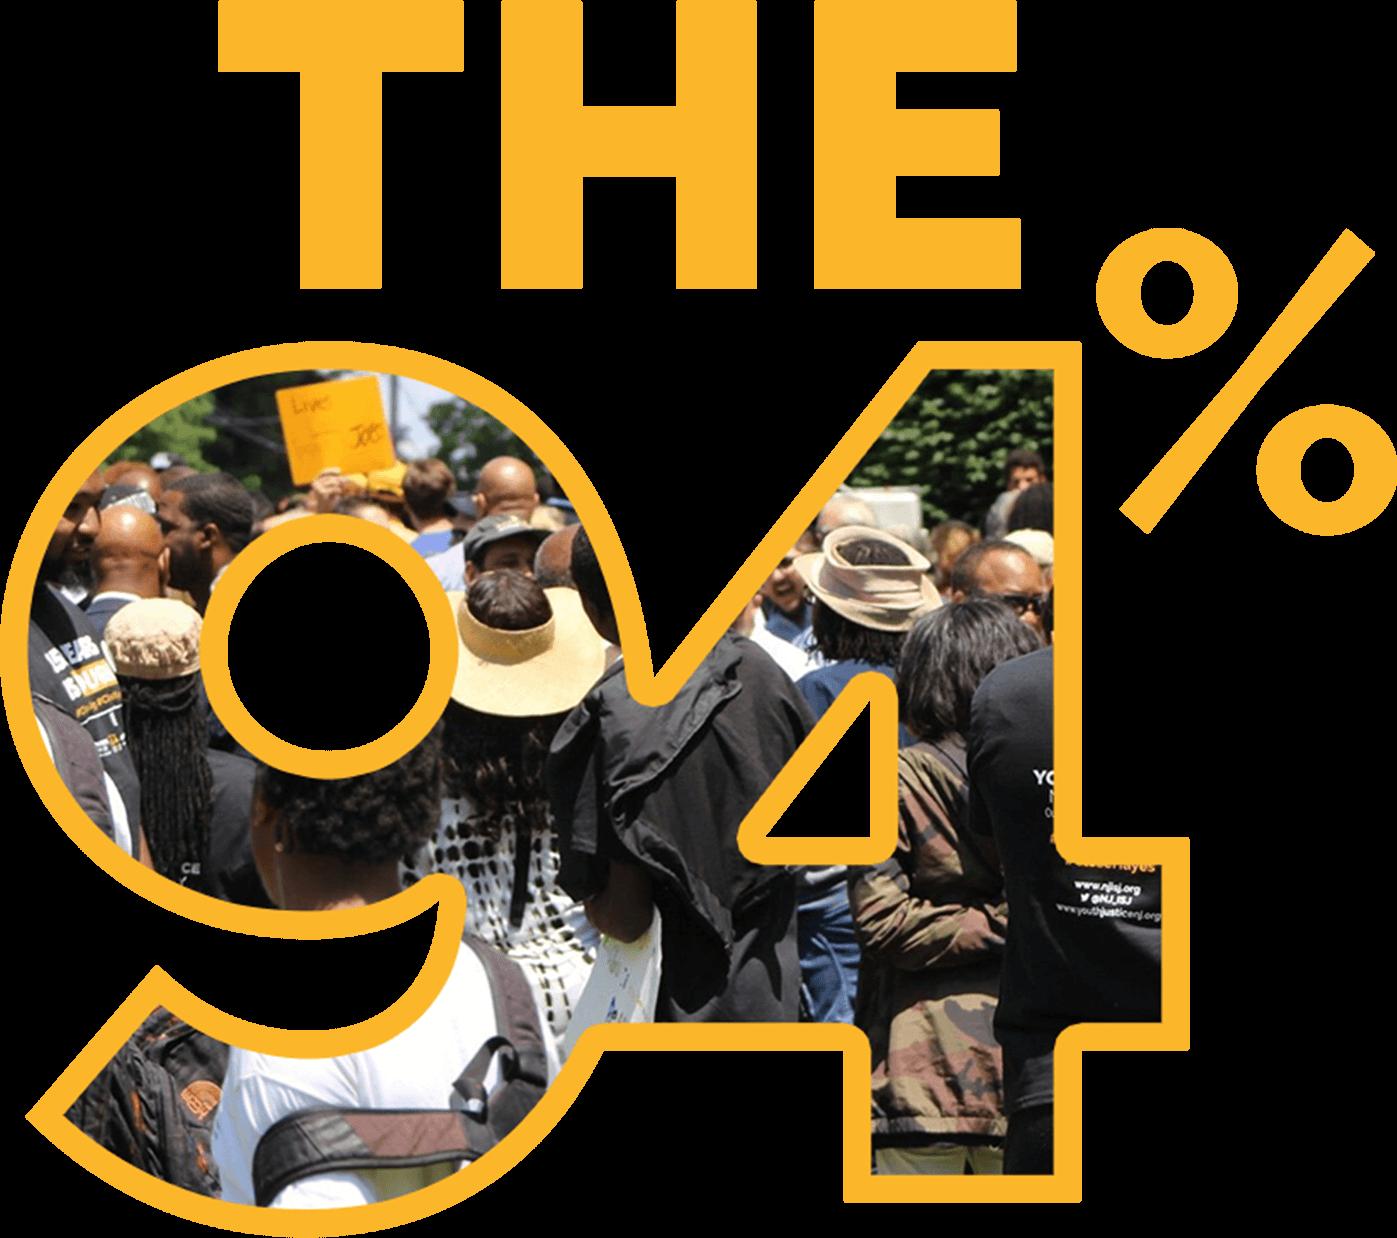 njisj-94-percent-campaign-logo-V3-d-web.png